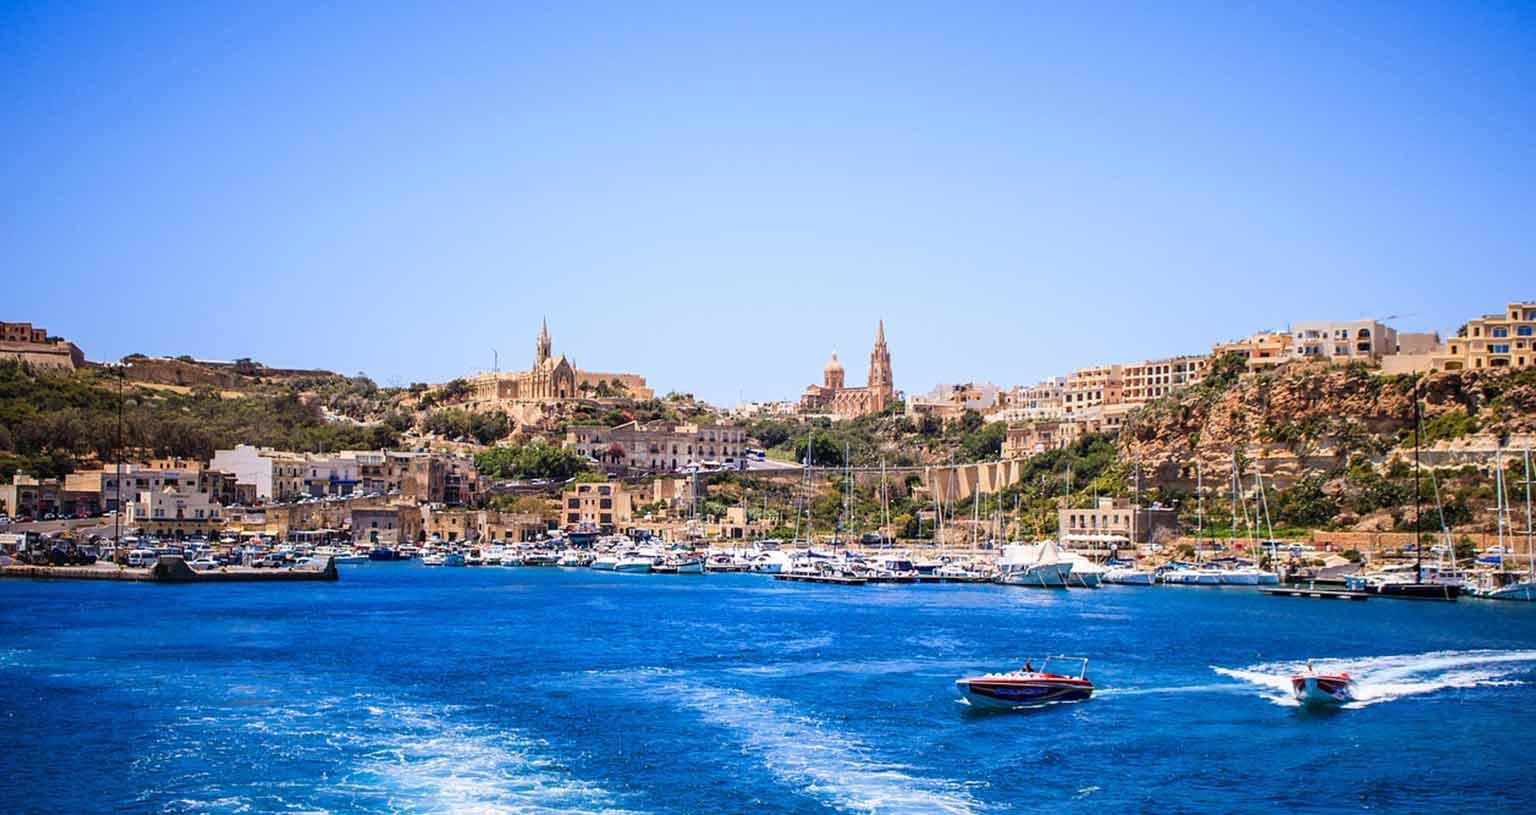 malta-vanlife-freistehen-felsen-boot